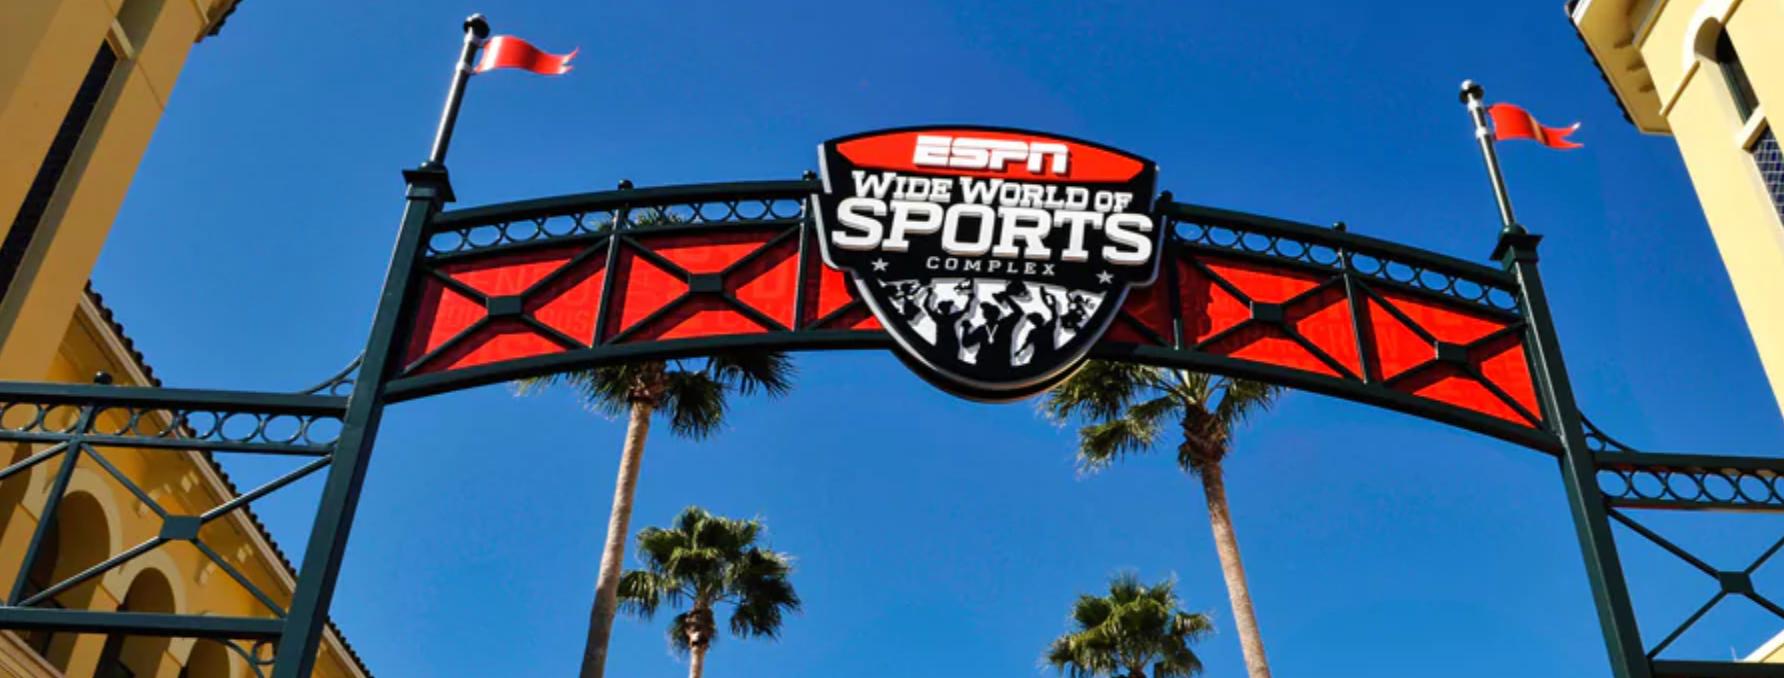 Major League Soccer Disney World